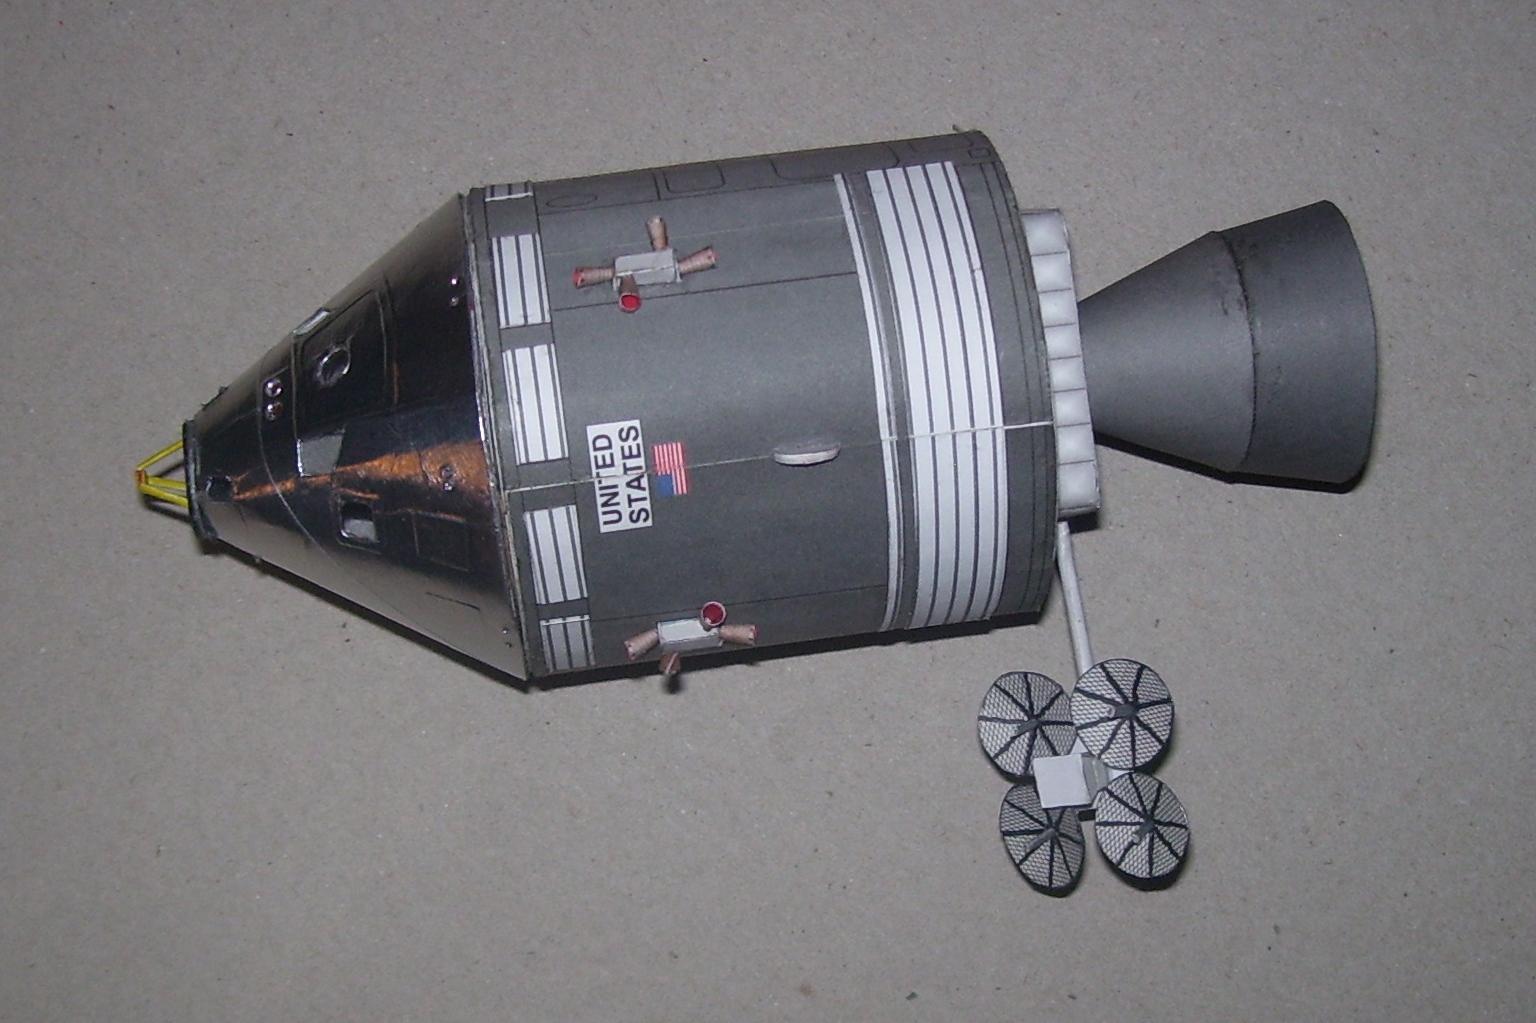 apollo spacecraft paper model - photo #30